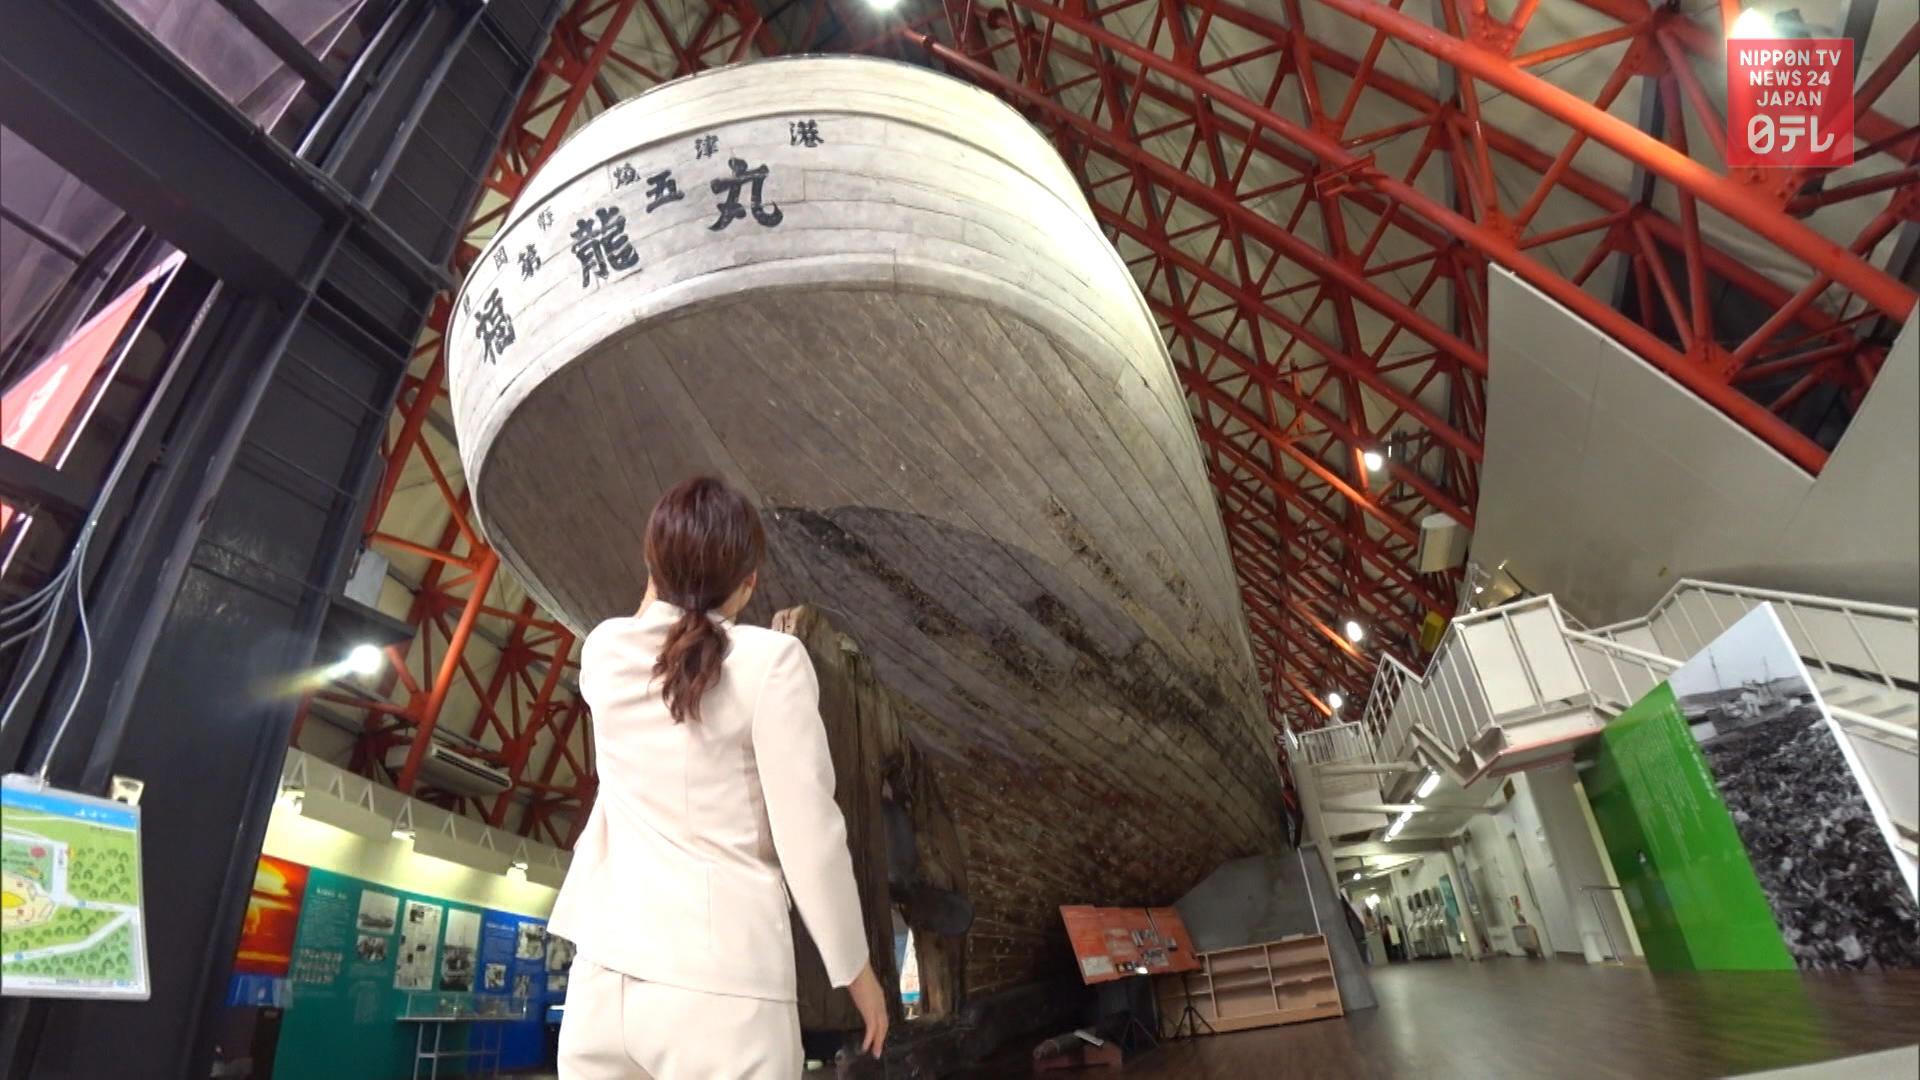 Daigo Fukuryu Maru - Japan's 3rd encounter with nuclear fallout